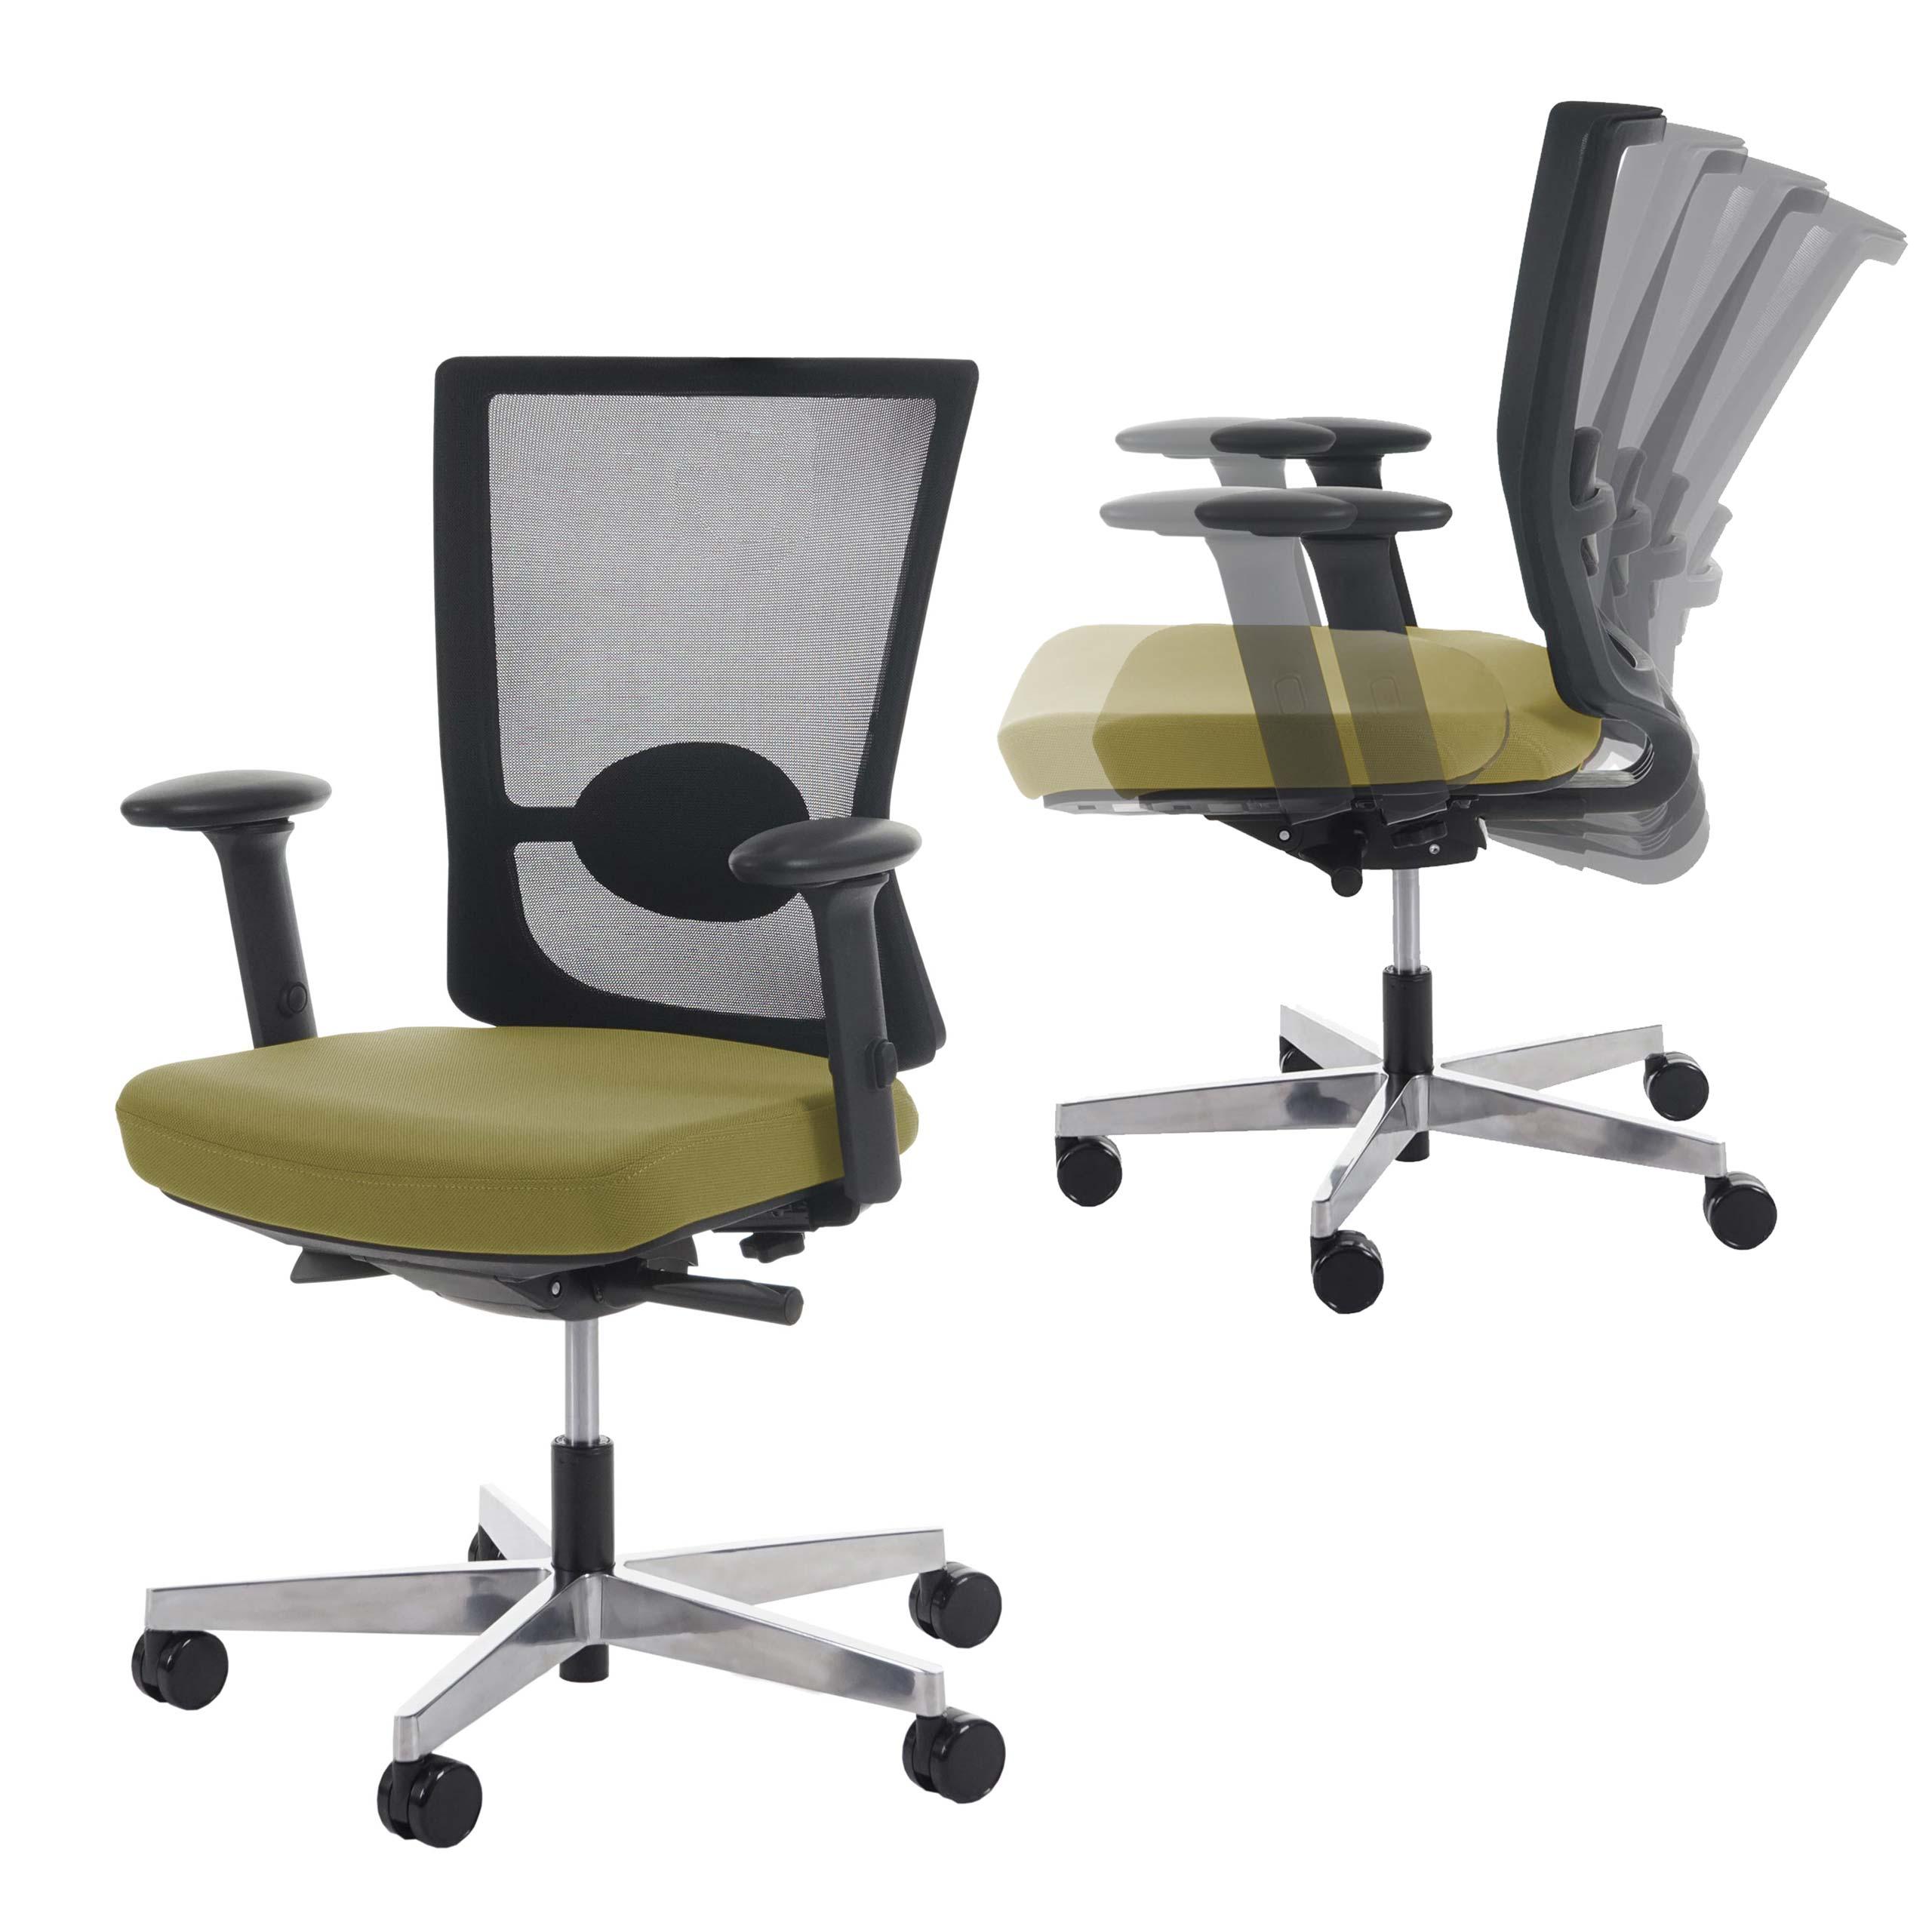 Bürostuhl ergonomisch holz  Bürostuhl Belfast, Schreibtischstuhl Drehstuhl, ergonomisch ~ olive